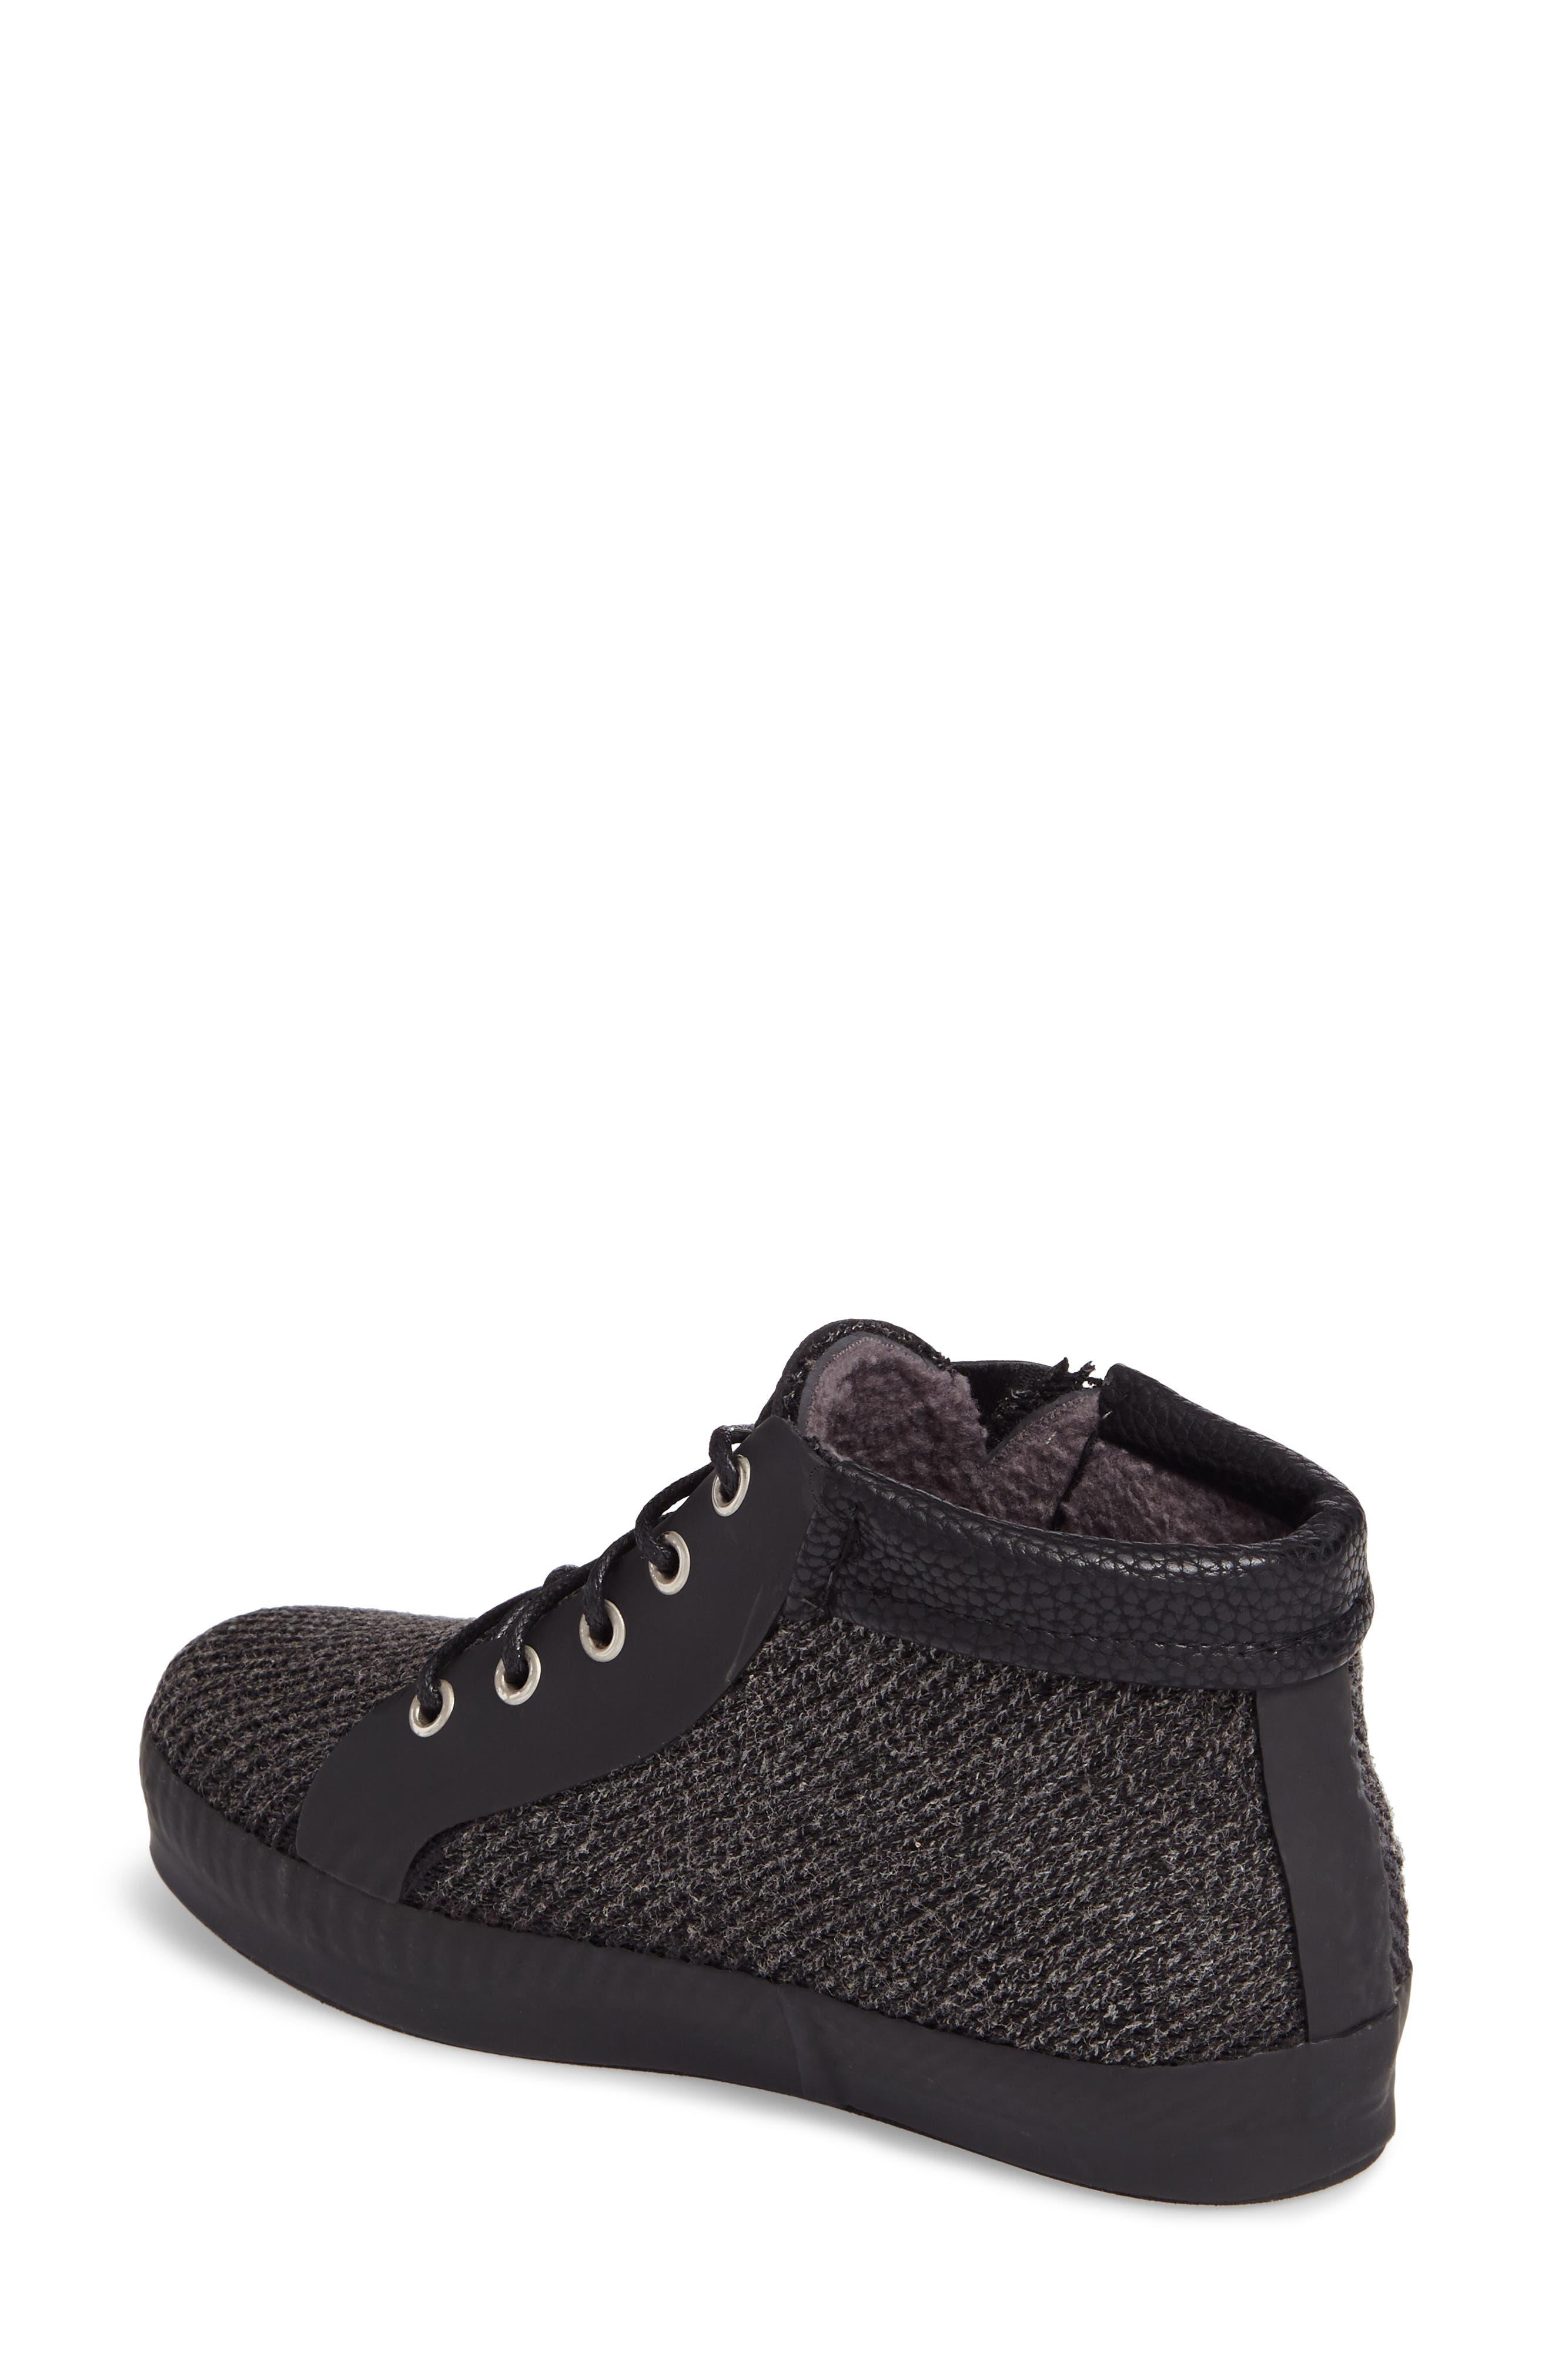 Hampton Waterproof Mid Sneaker,                             Alternate thumbnail 2, color,                             Black Fabric